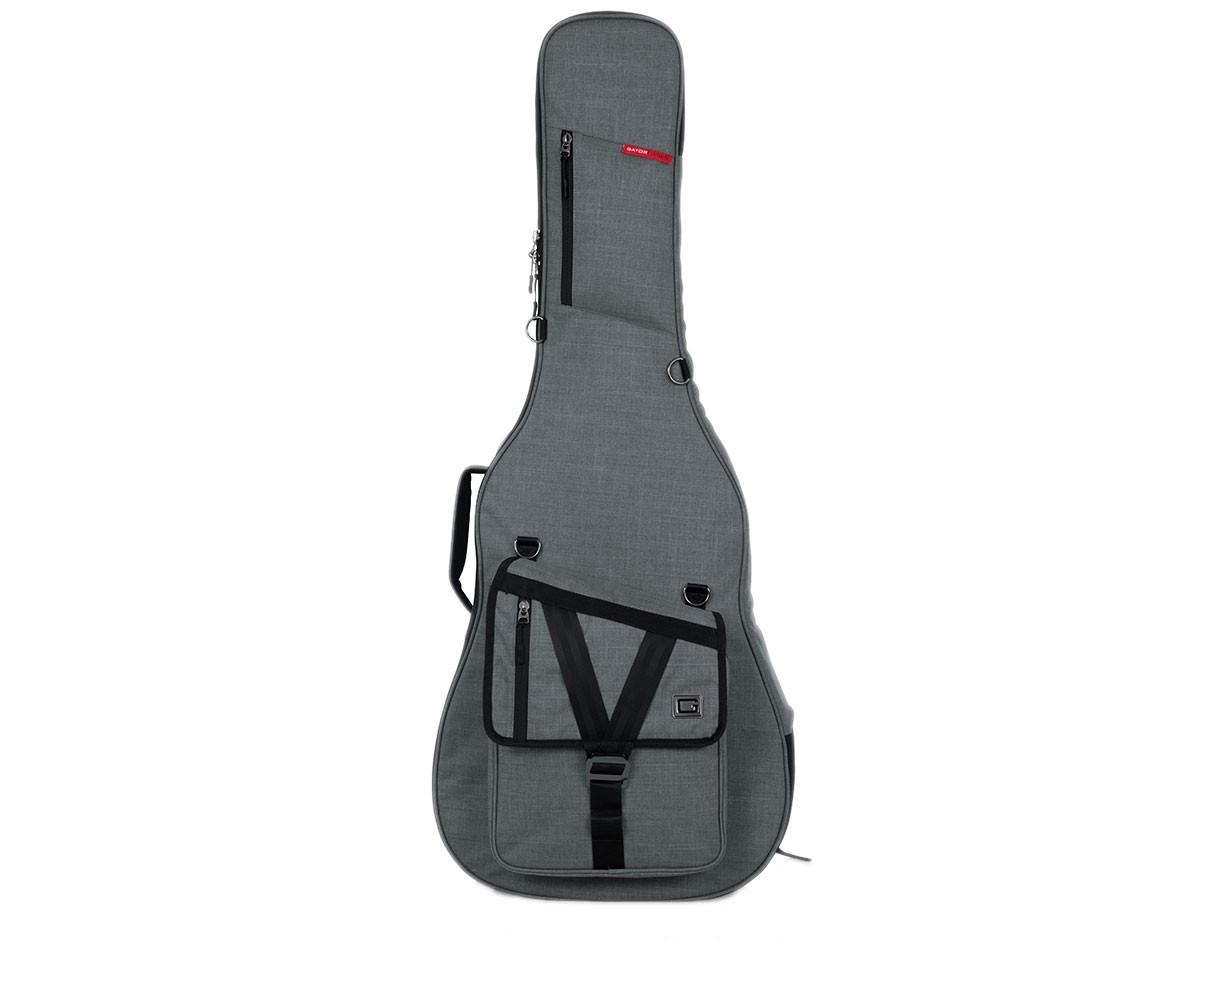 Gator GT-ACOUSTIC-GRY Transit Acoustic Guitar Bag - Light Grey